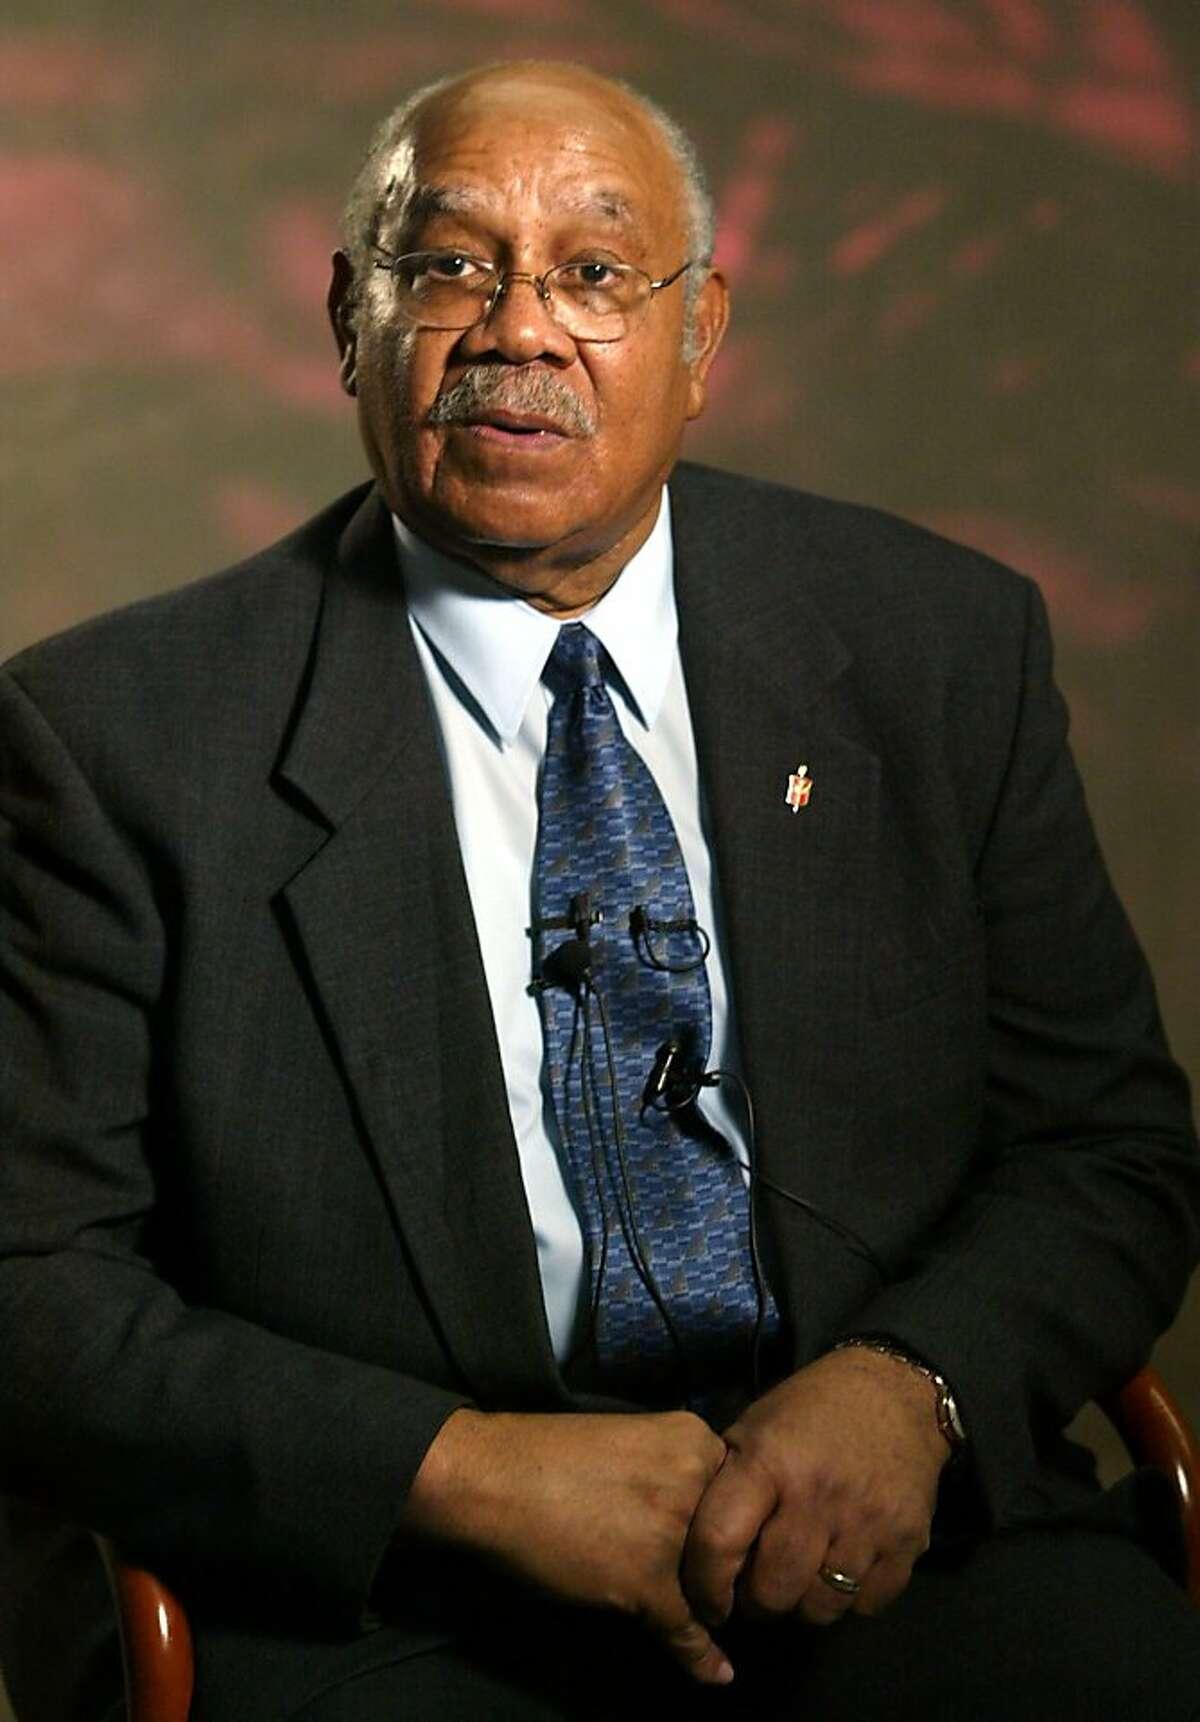 United Methodist Bishop Melvin Talbert talks to a journalist at the Vanderbilt University Divinity school in Nashville, Tenn., Wednesday, Jan. 29, 2003. Talbert will appear in an anti-war commercial aimed at persuading President Bush, a fellow Methodist, that a U.S. attack on Iraq would violate ``God's law.'' (AP Photo/Neil Brake) Ran on: 06-16-2004 Ran on: 06-16-2004 Melvin Talbert is a top bishop of President Bush's church. Ran on: 06-16-2004 Melvin Talbert is a top bishop of President Bush's church.